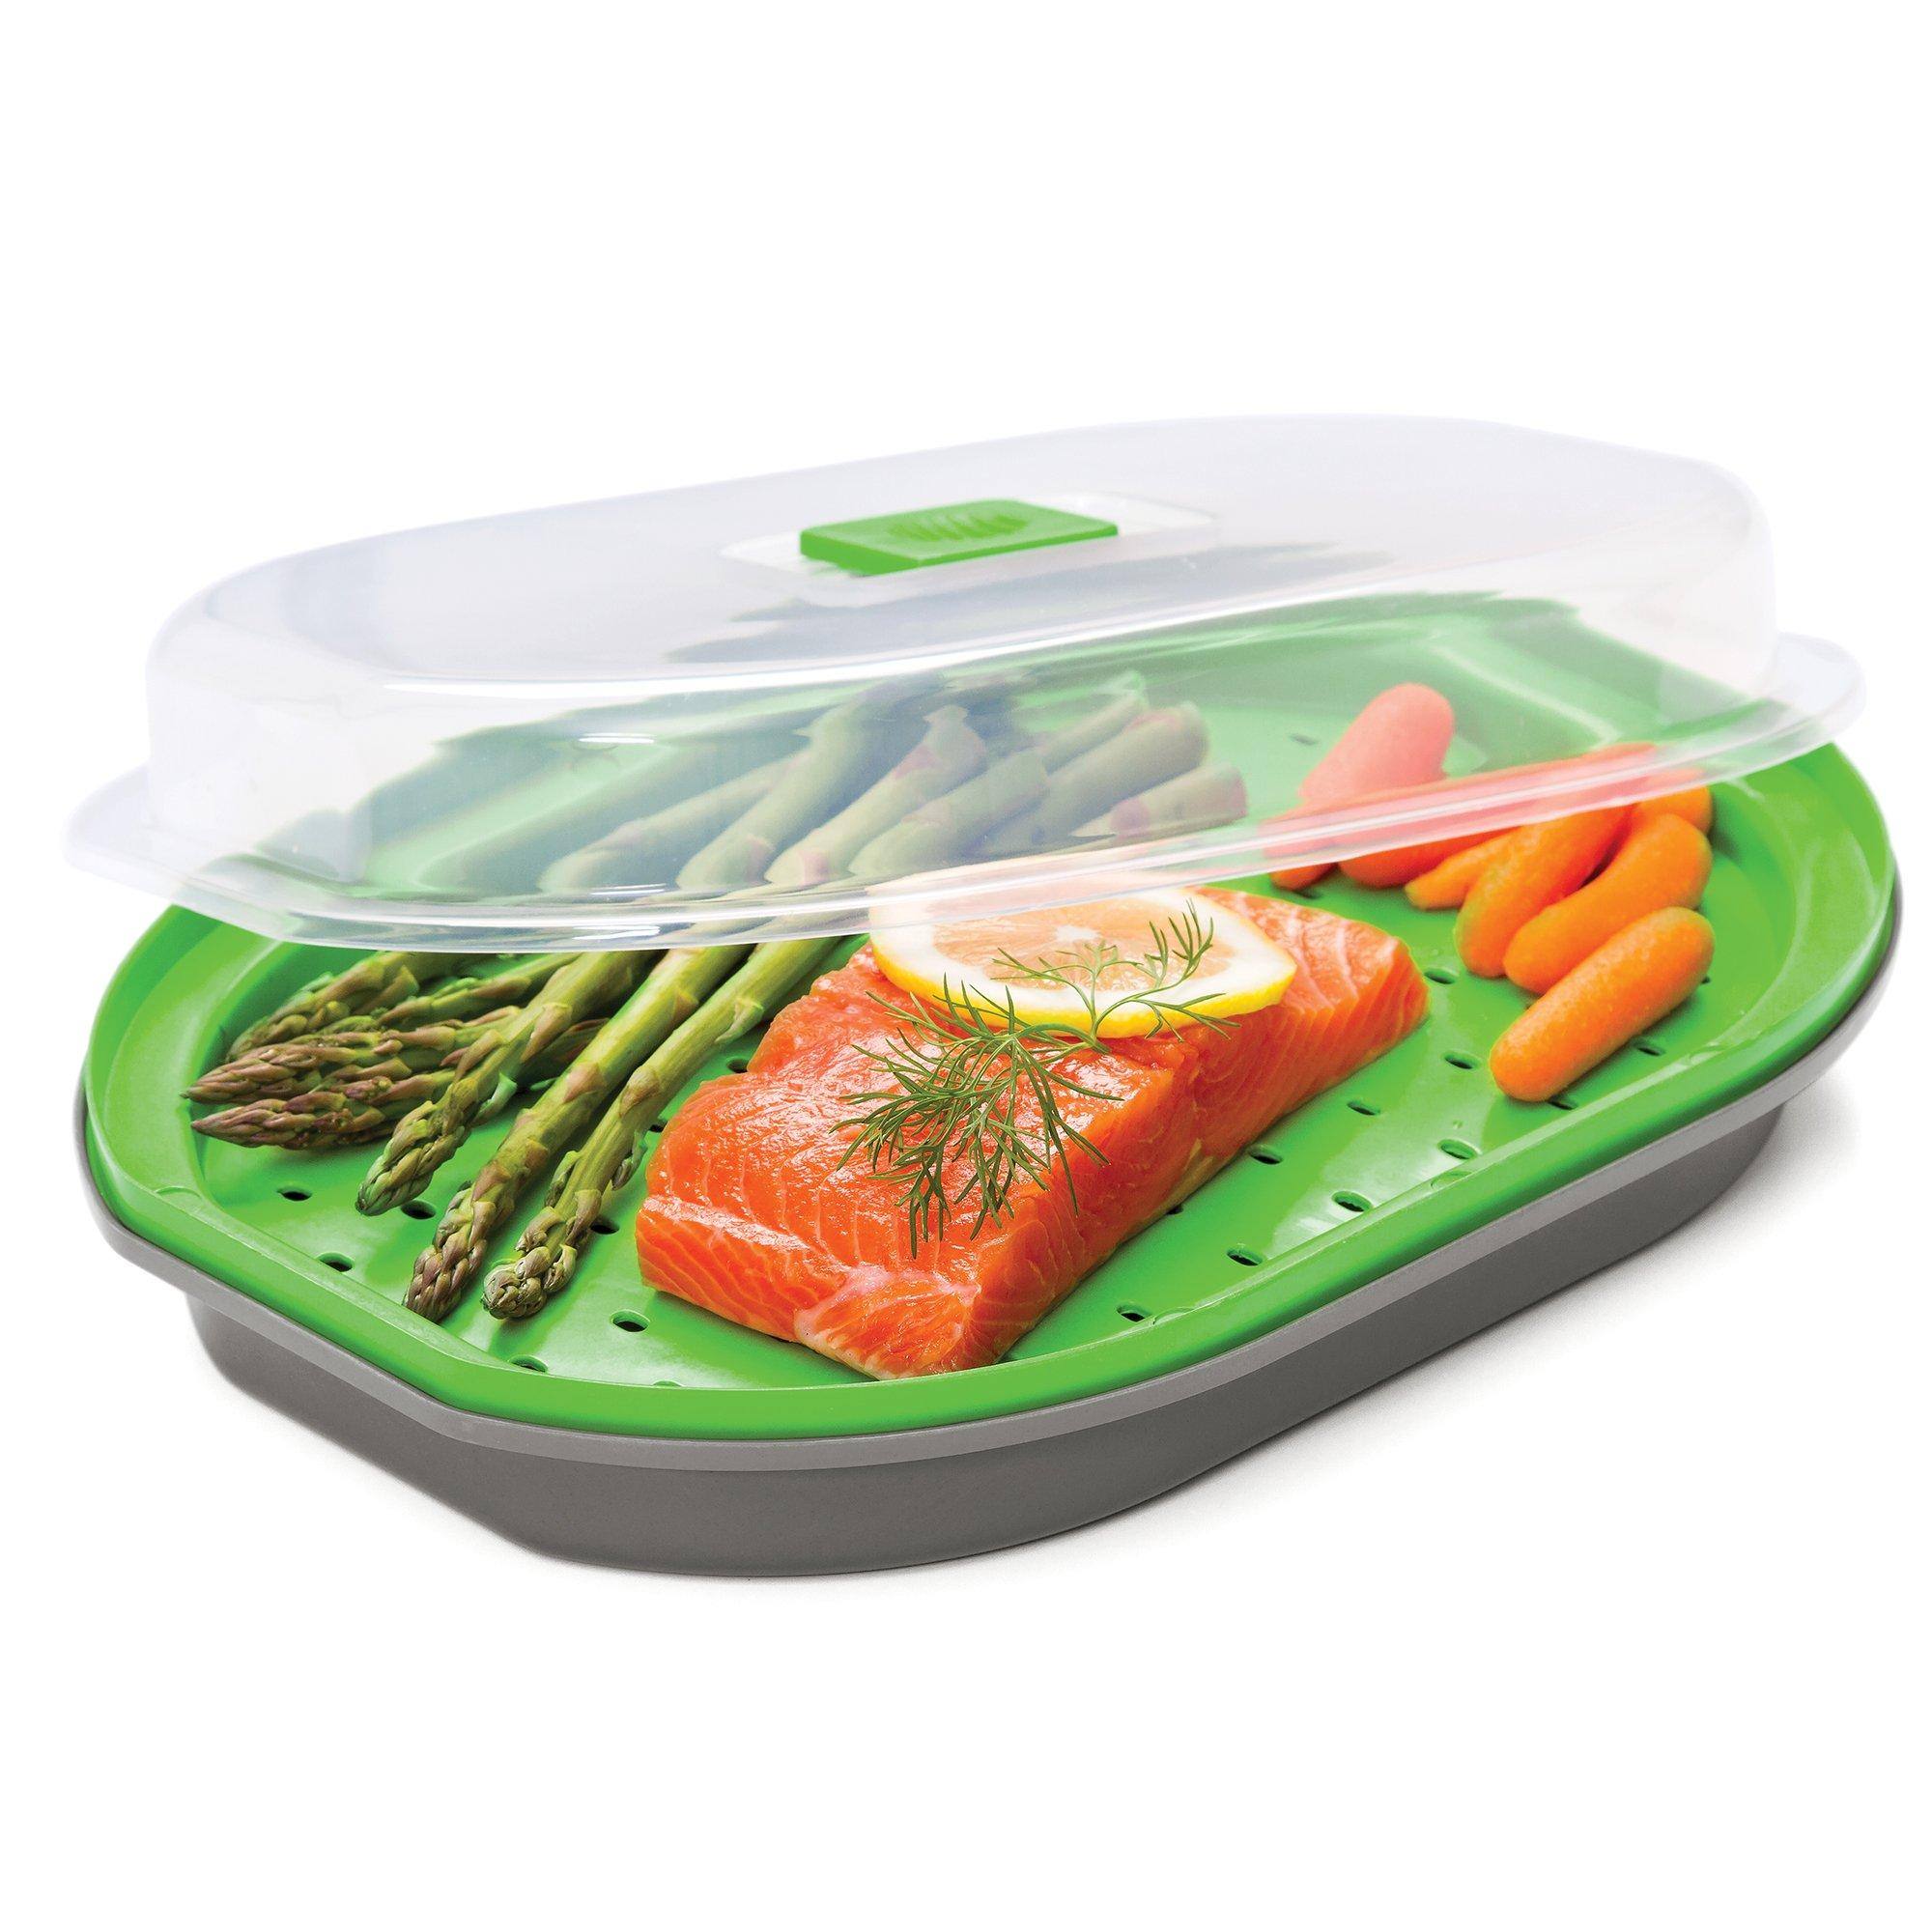 Prep Solutions Microwave Fish and Veggie Steamer, Adjustable Steam Vent Control, Vegetable Steamer, BPA FREE, Dishwasher Safe